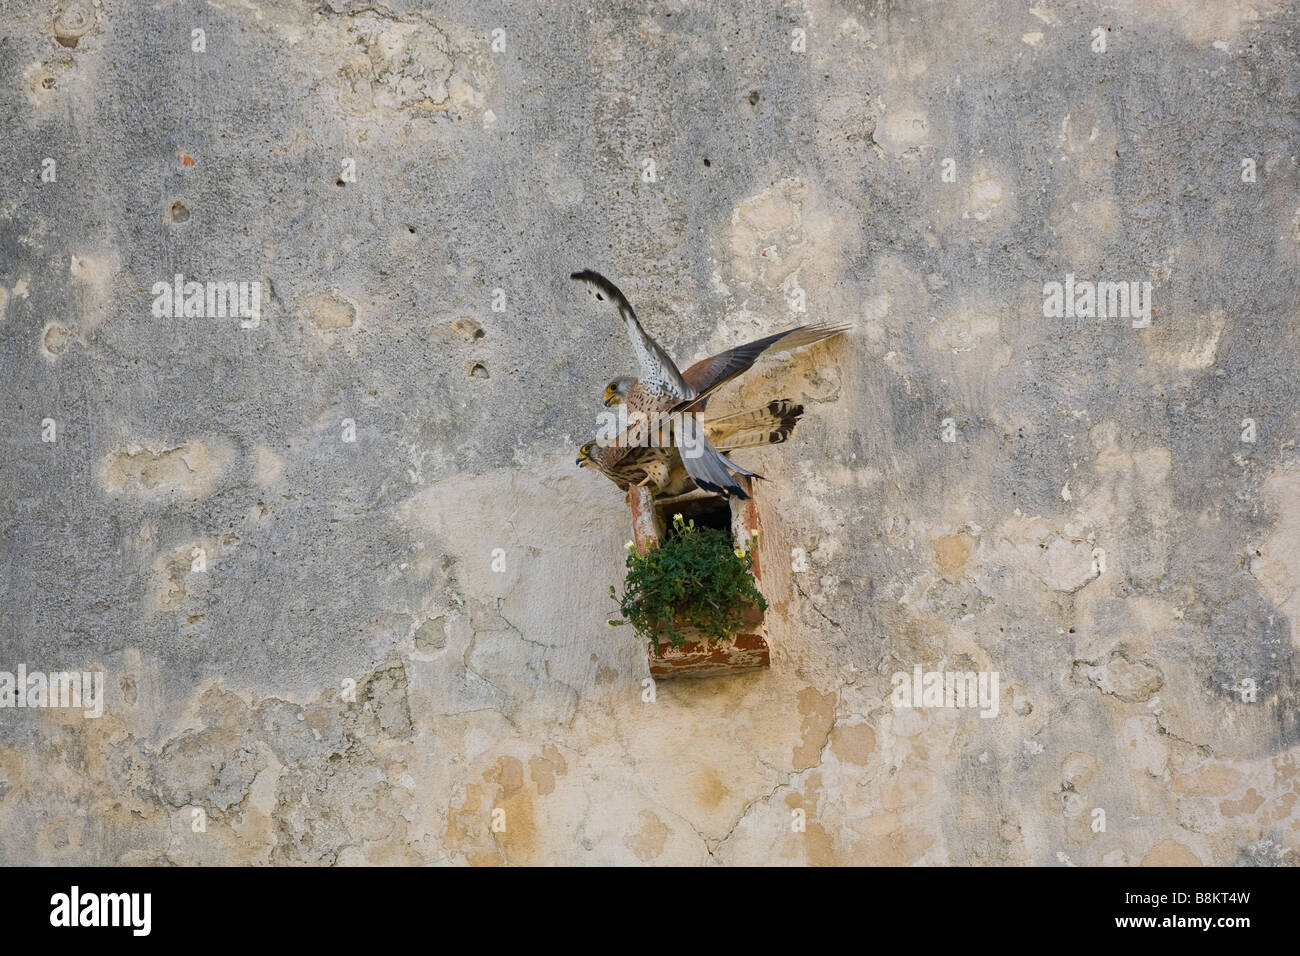 Lesser kestrels mating tarifa southern spain - Stock Image